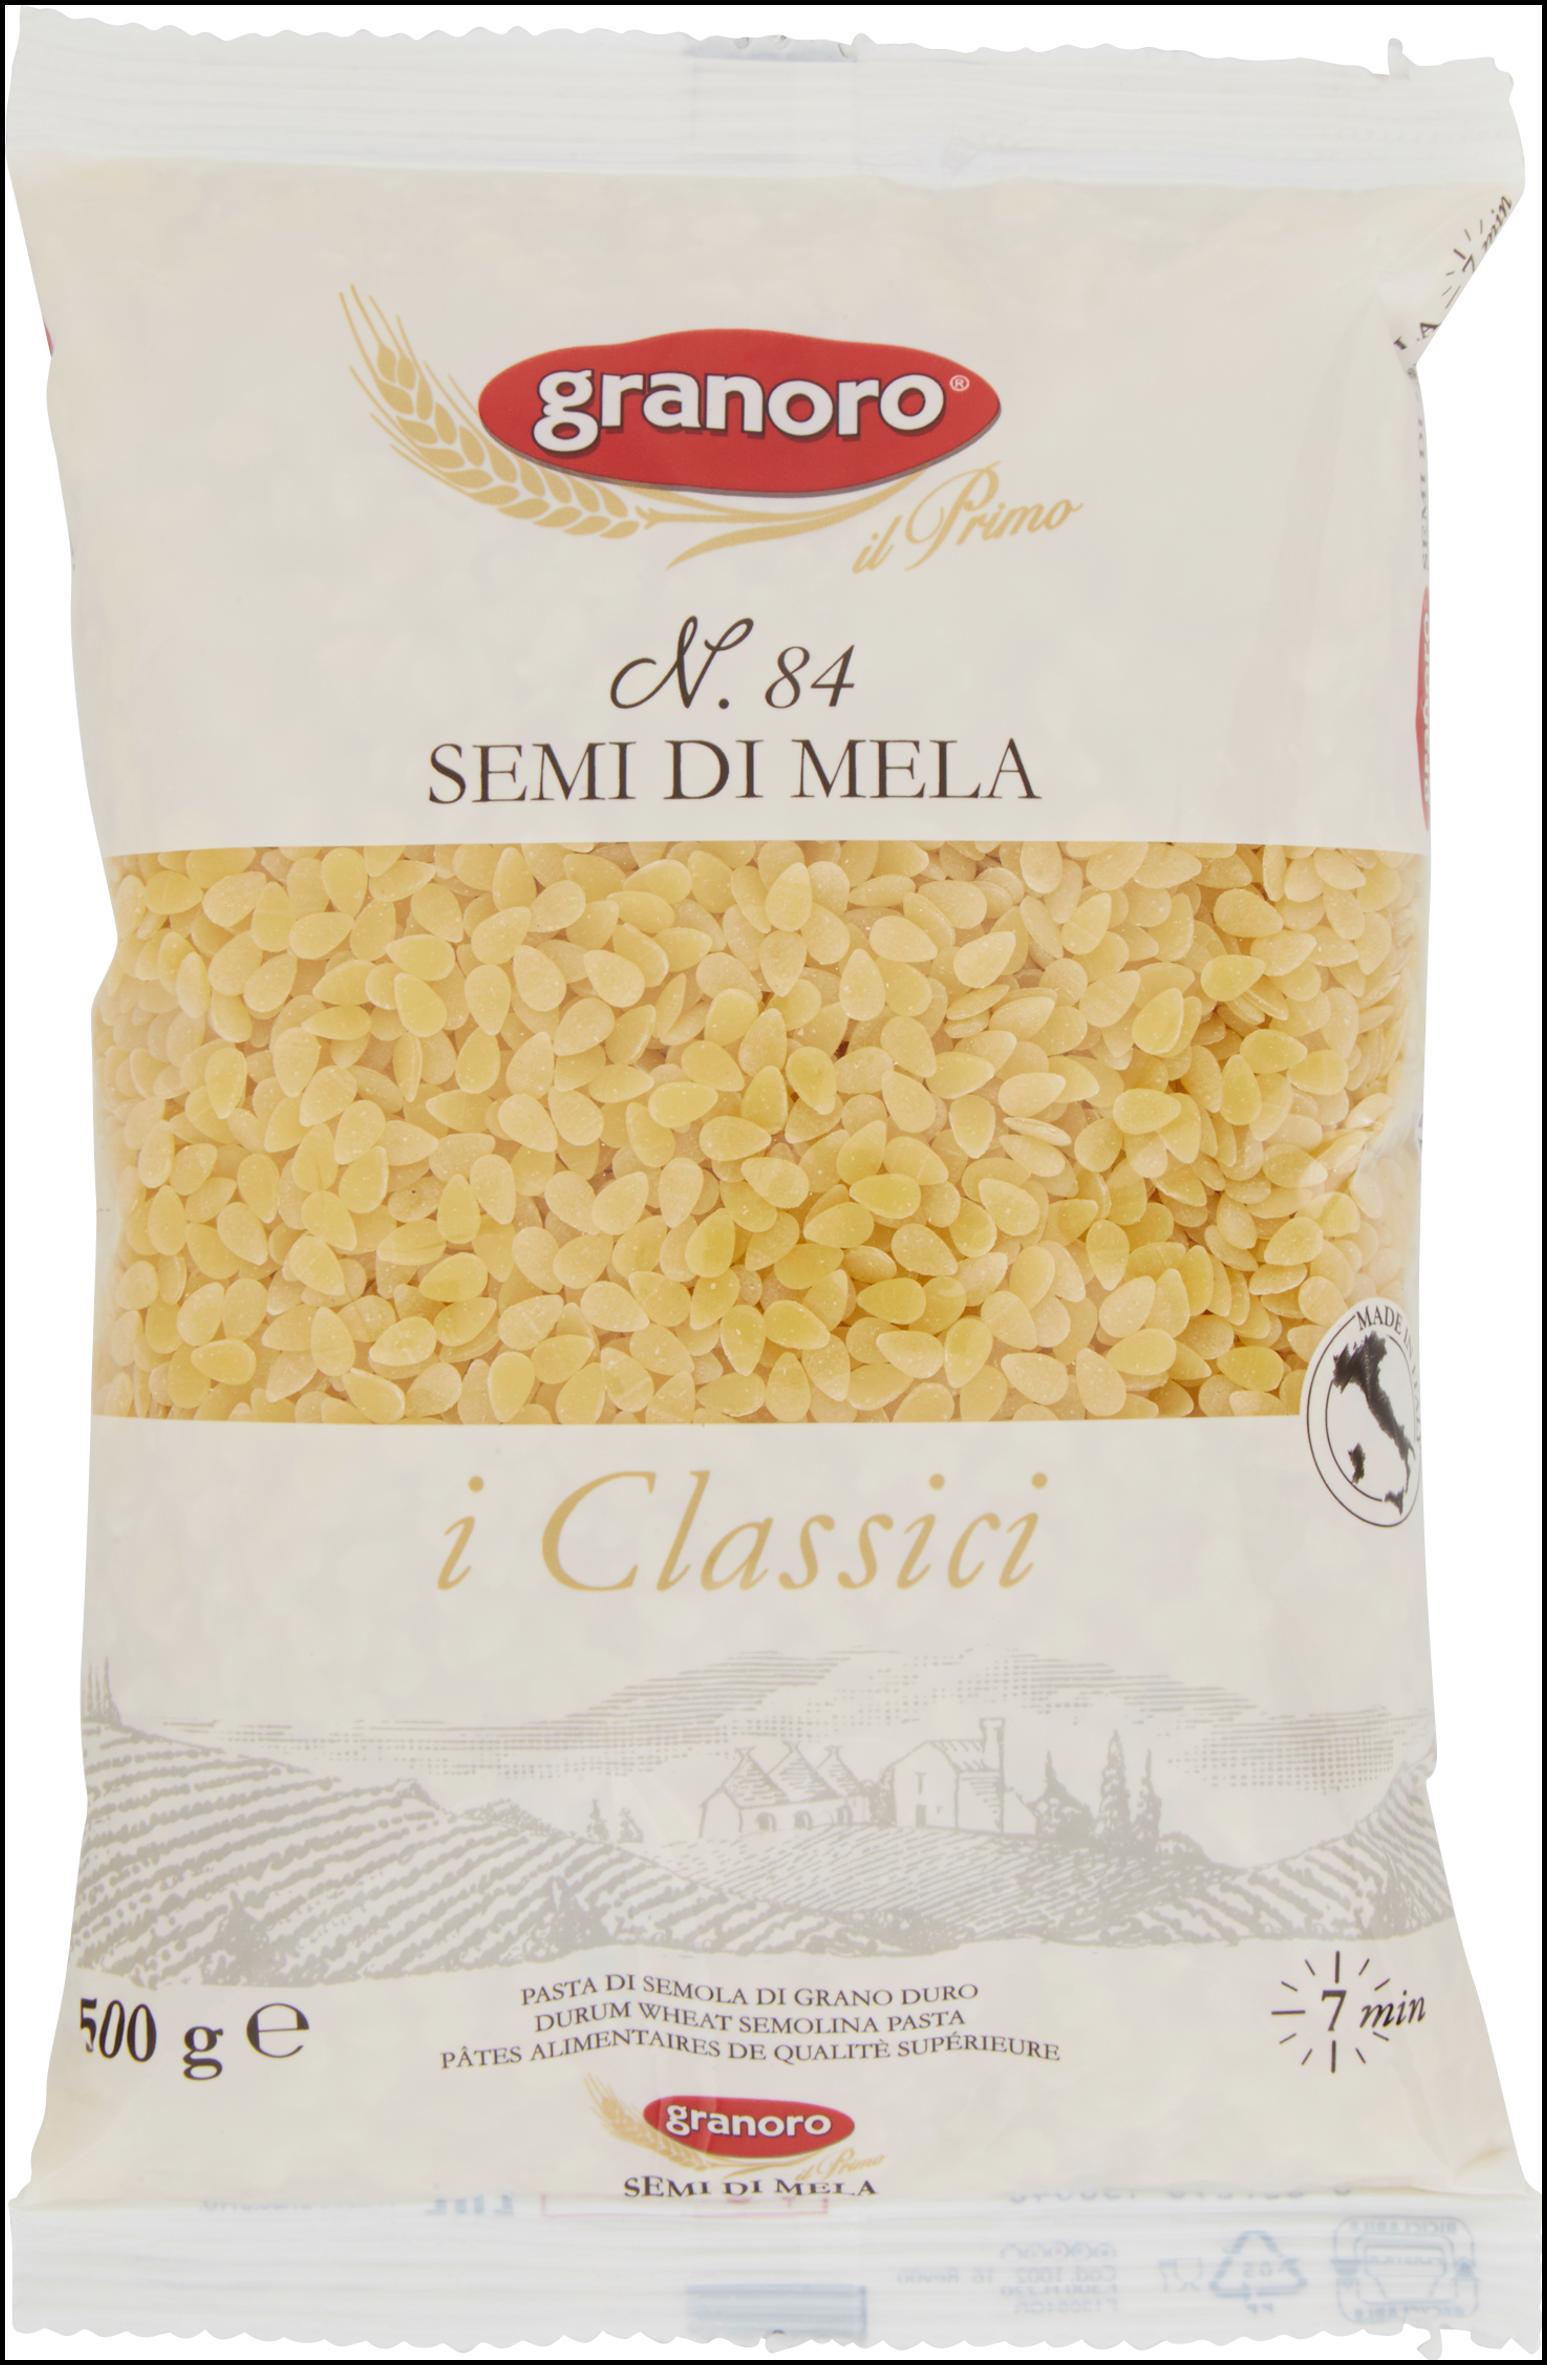 SEMI DI MELA GRANORO 500G N.84